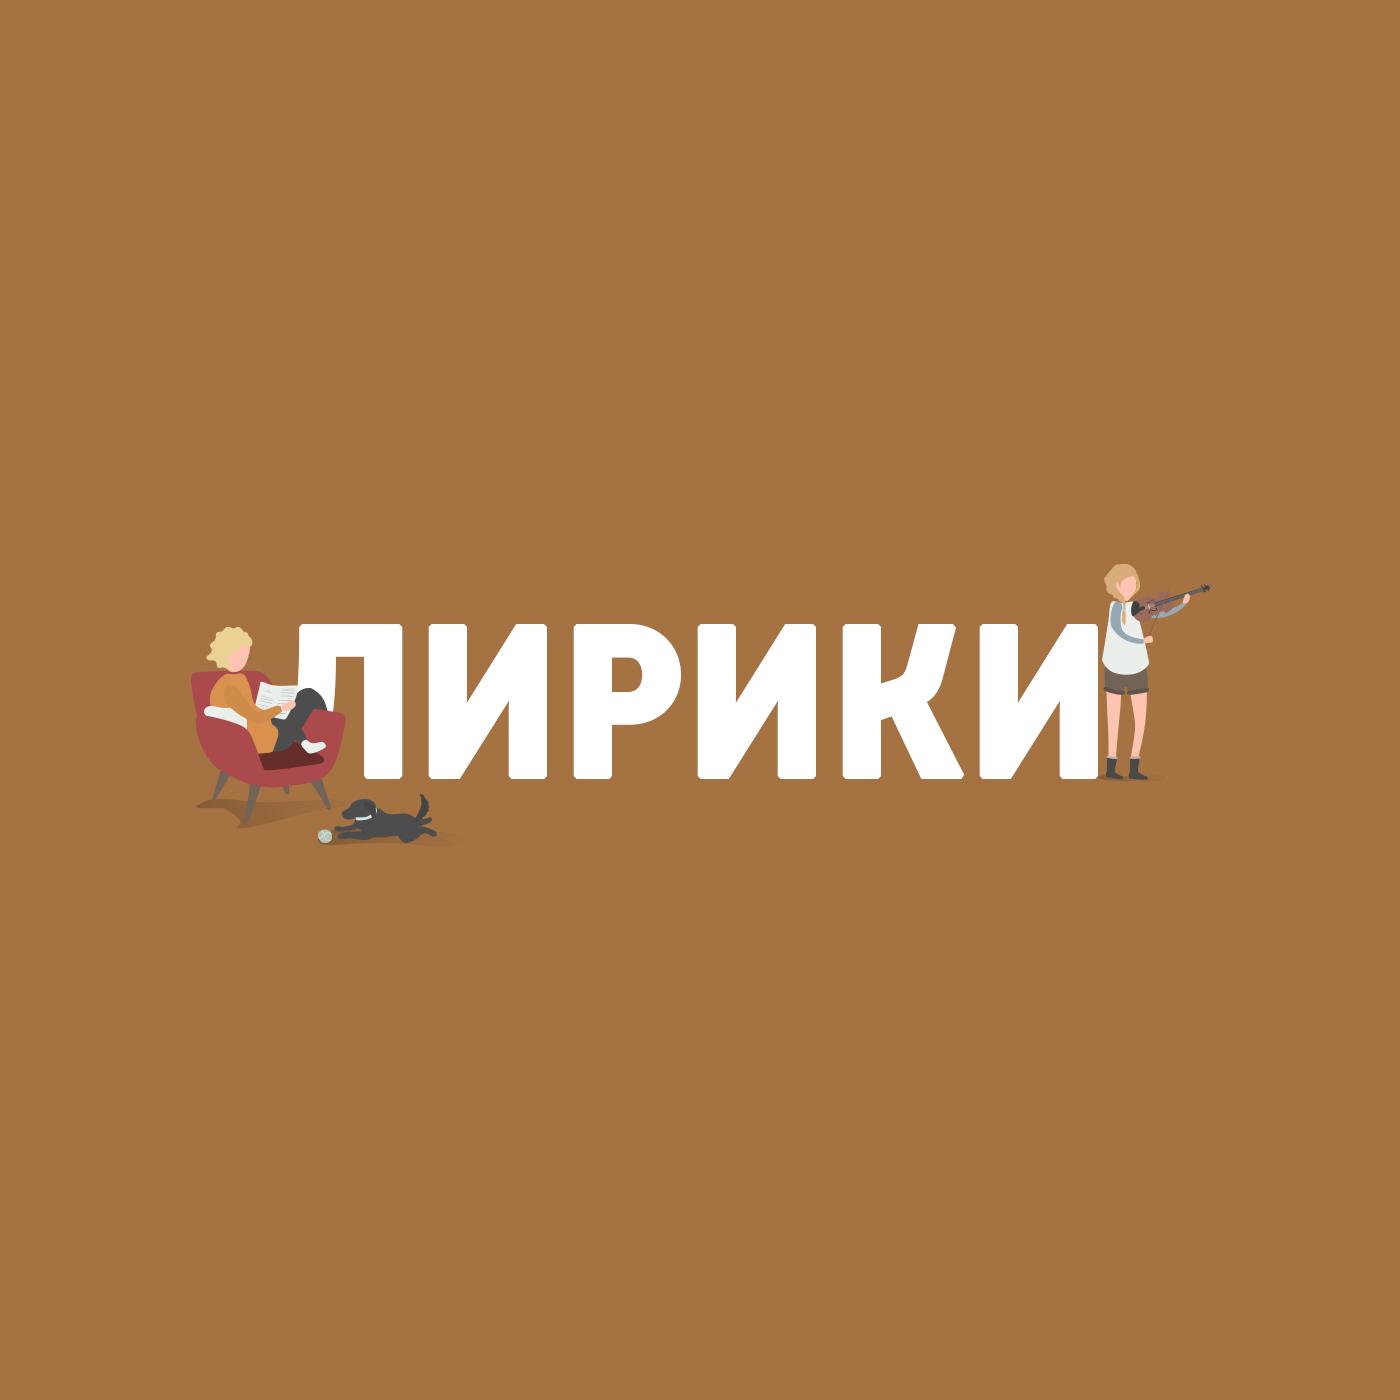 Маргарита Митрофанова Интервью Валерия Сюткина валерий леонтьев маргарита lp